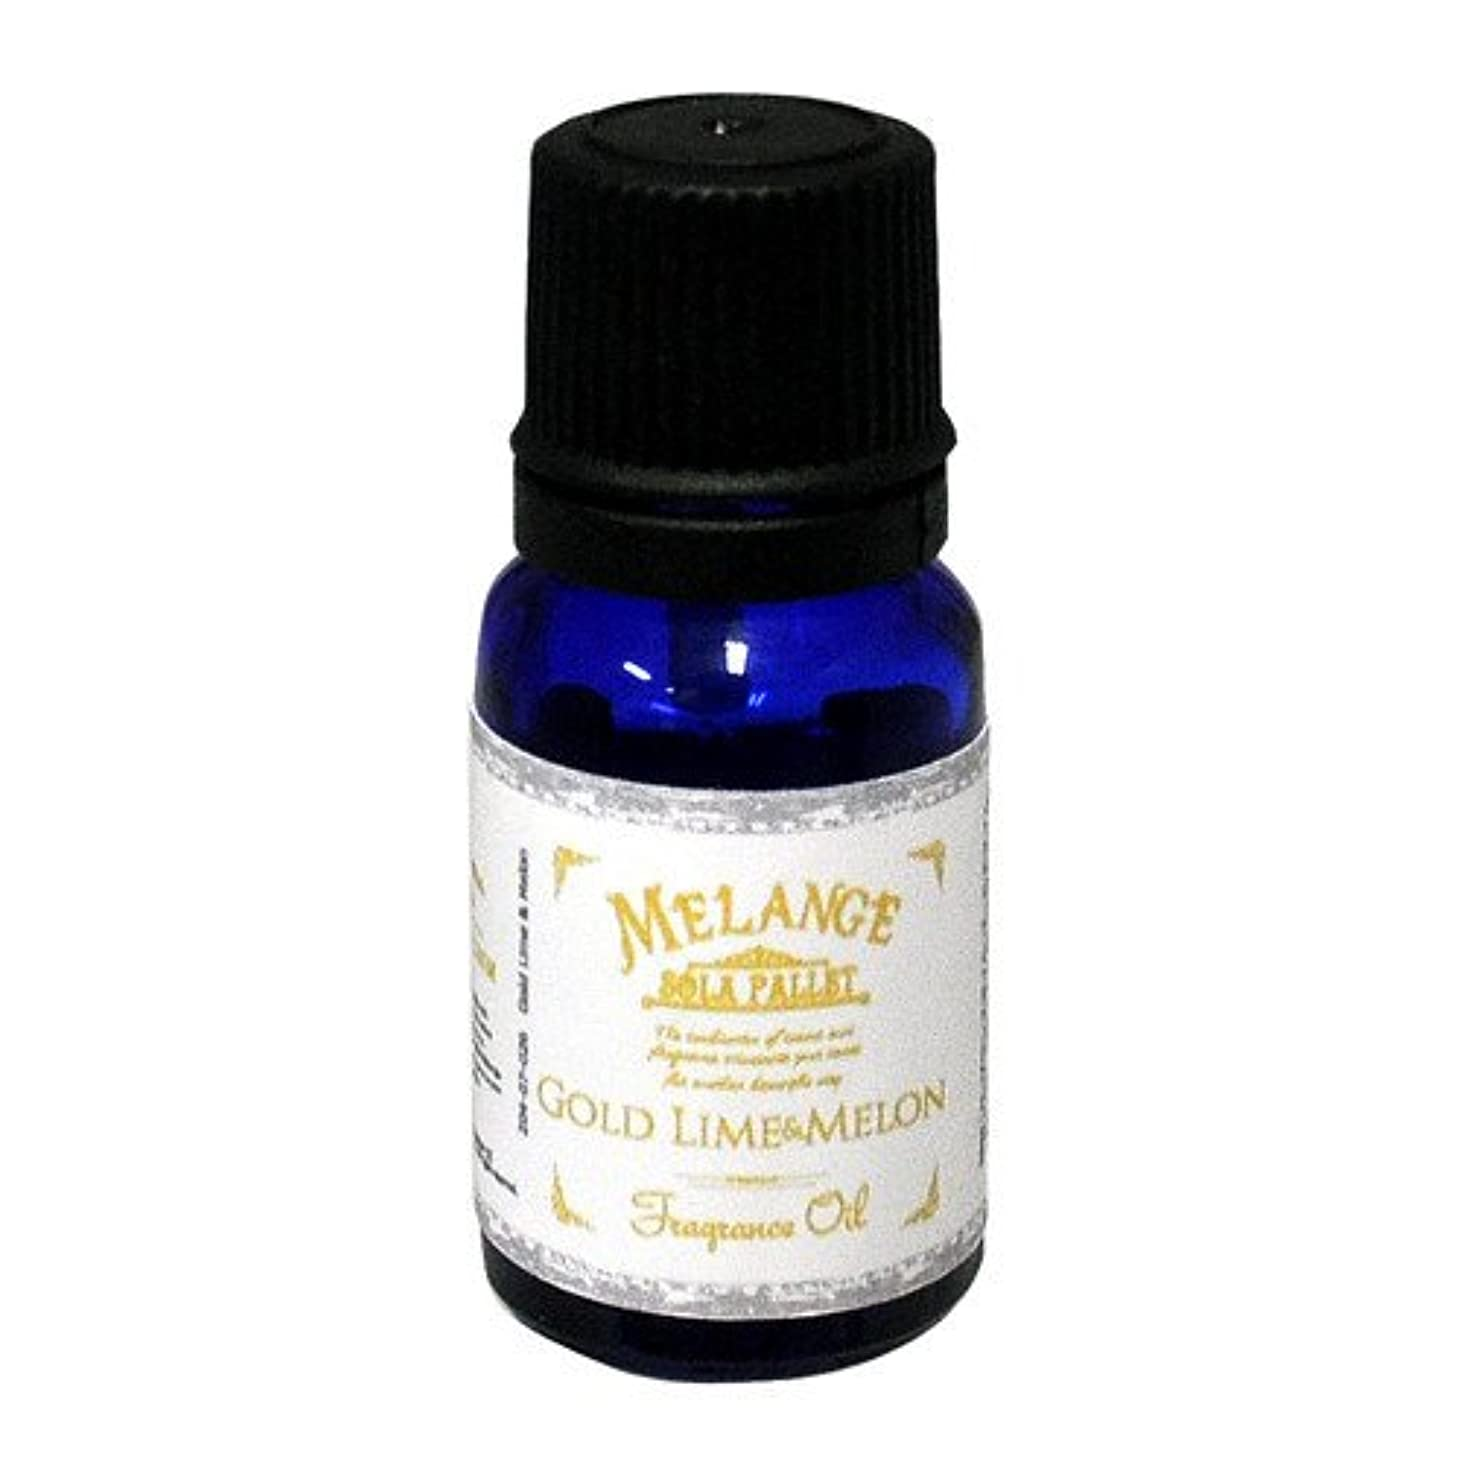 SOLA PALLET MELANGE Fragrance Oil フレグランスオイル Gold Lime&Melon ゴールドライム&メロン